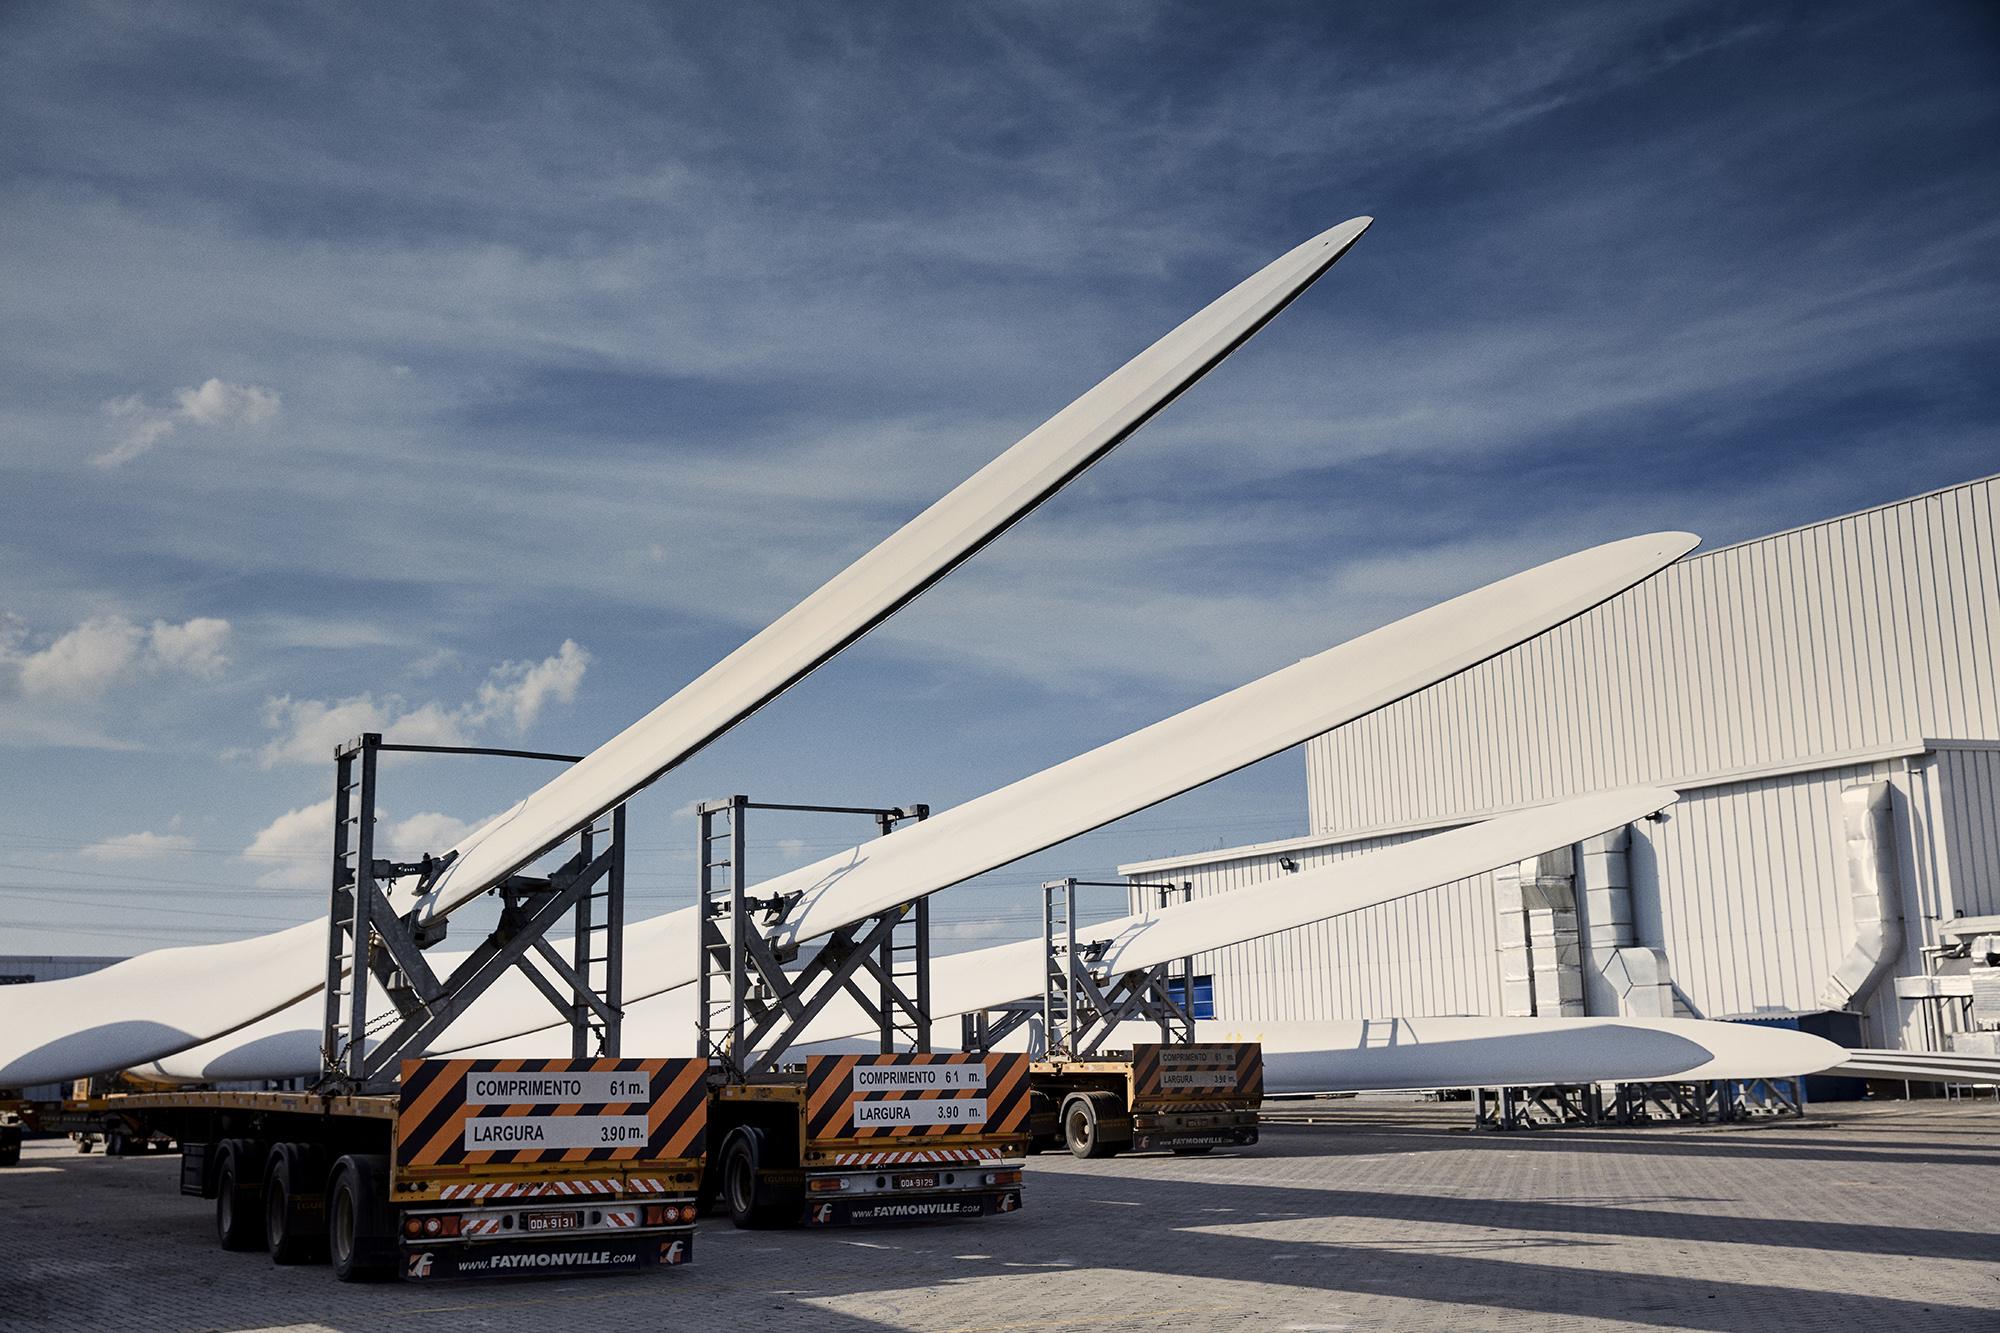 LM Wind Power turbine blades.